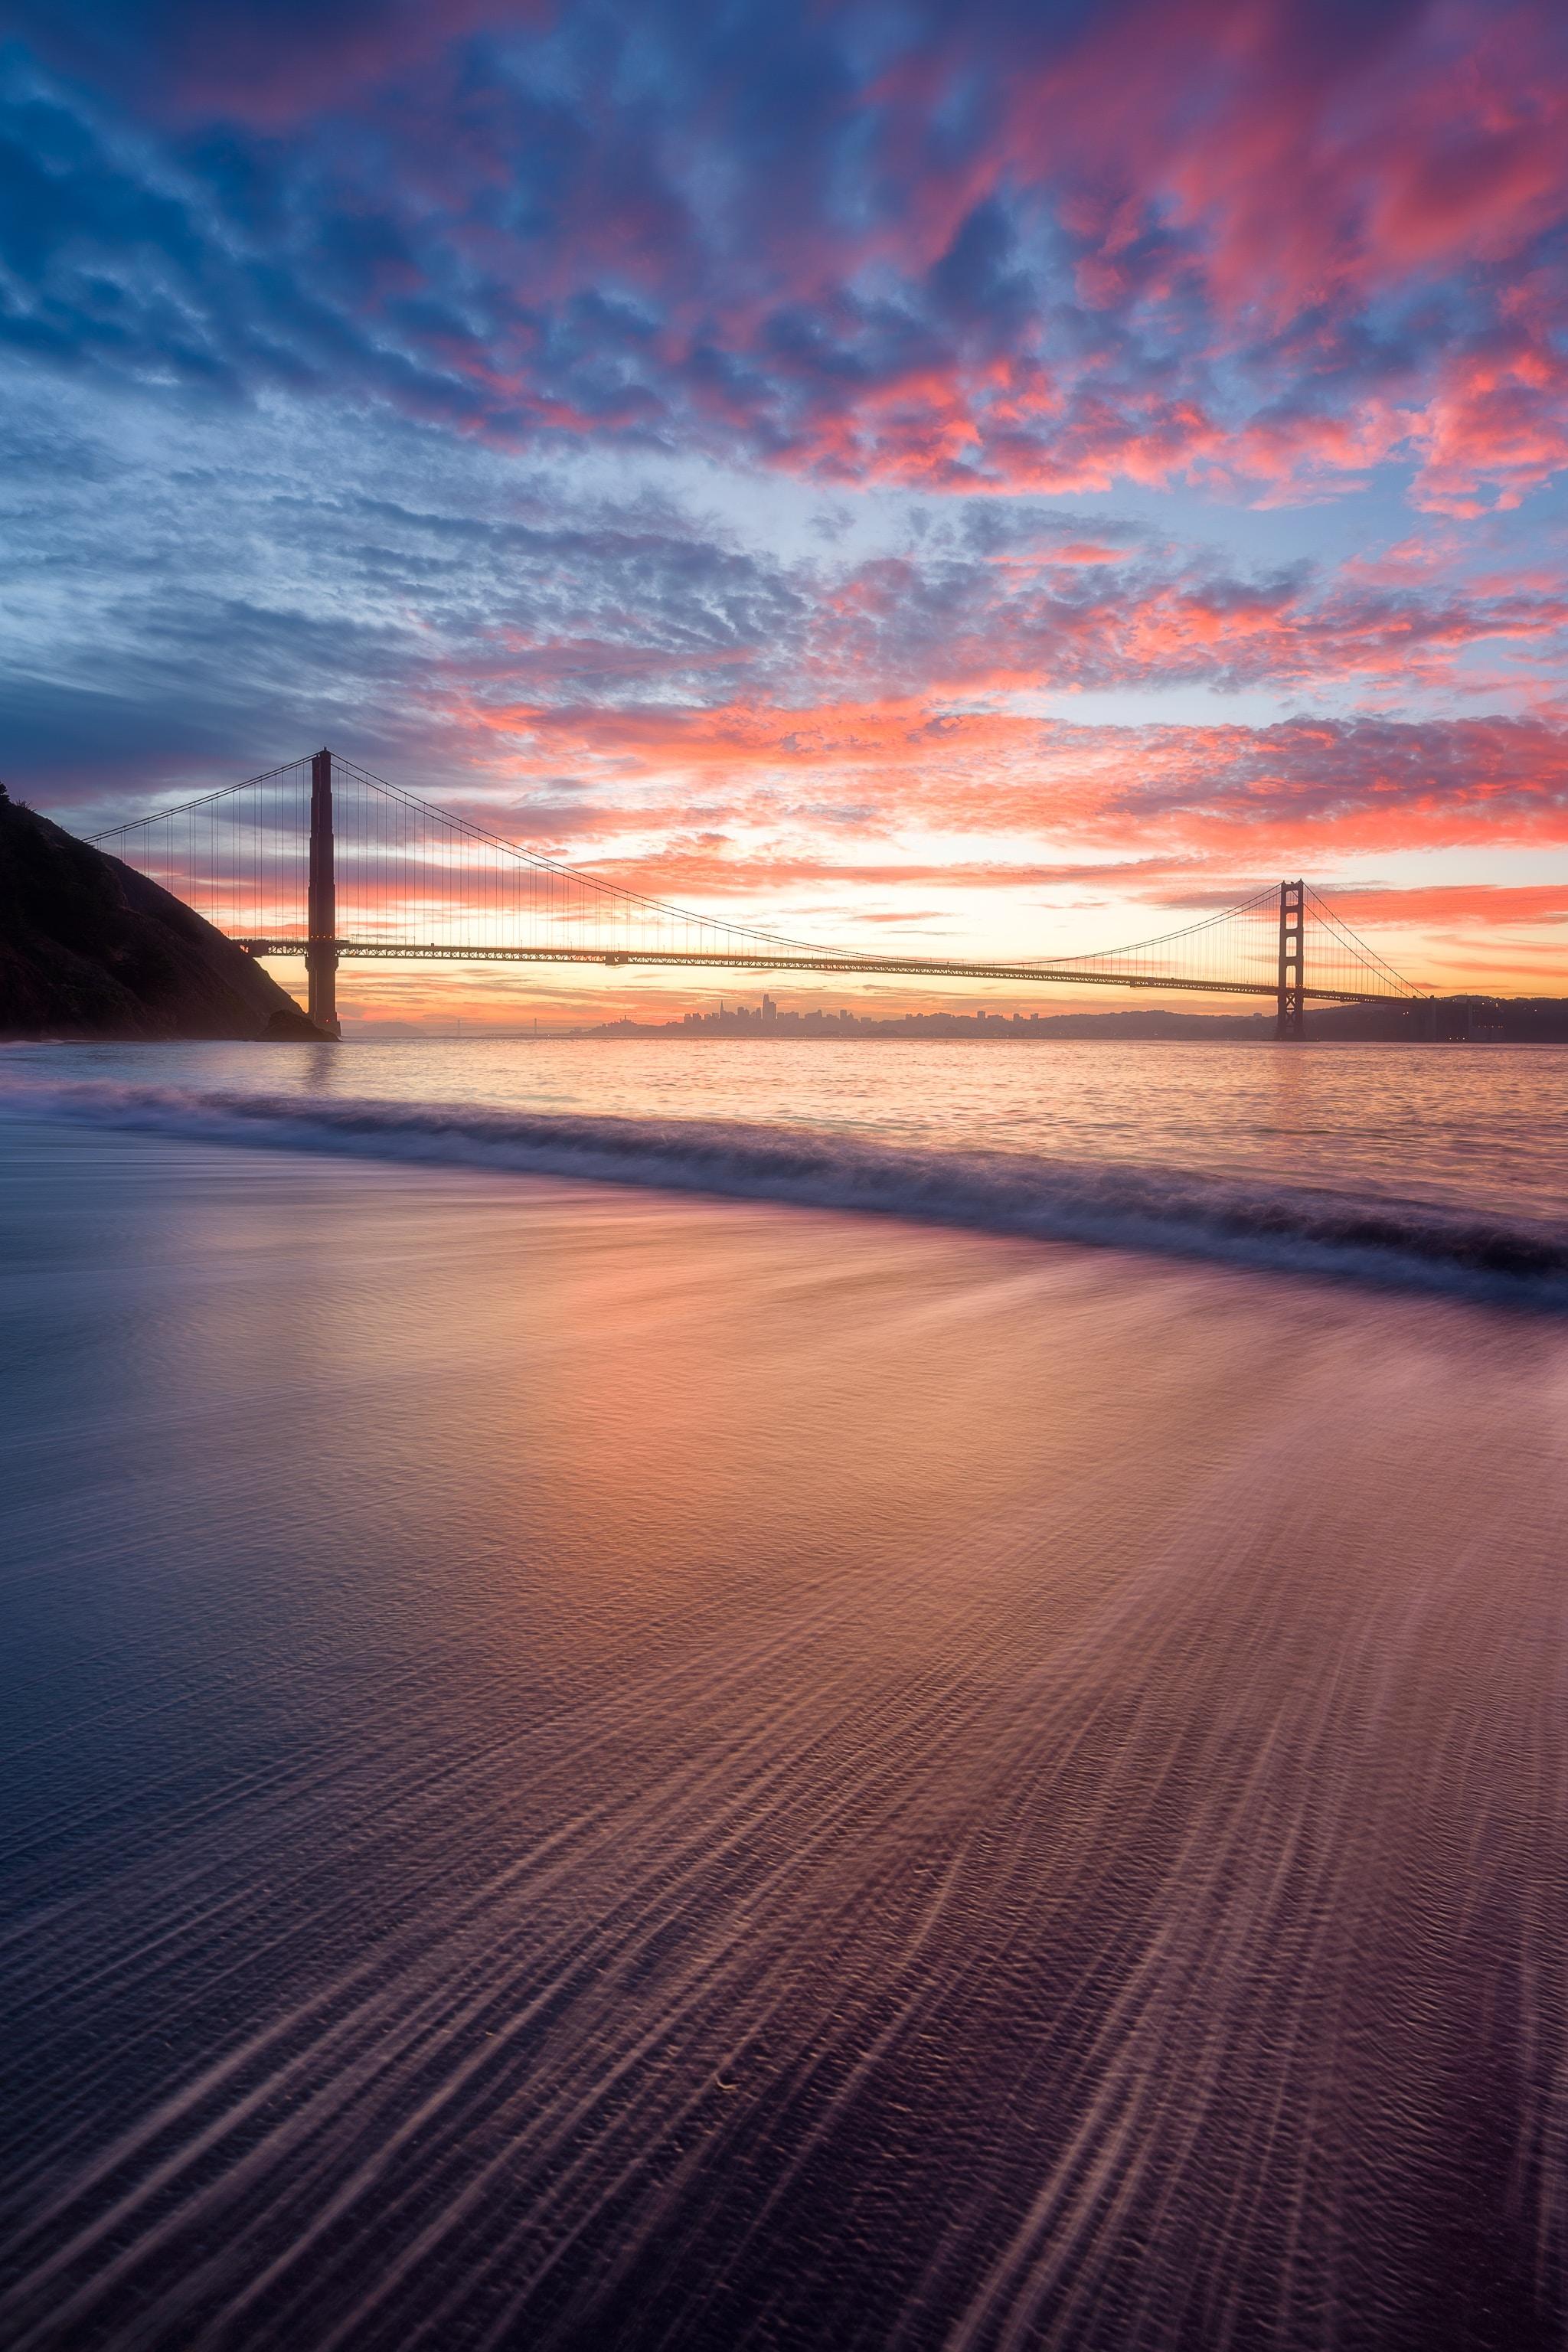 Golden Gate Bridge, San Francisco during golden hour